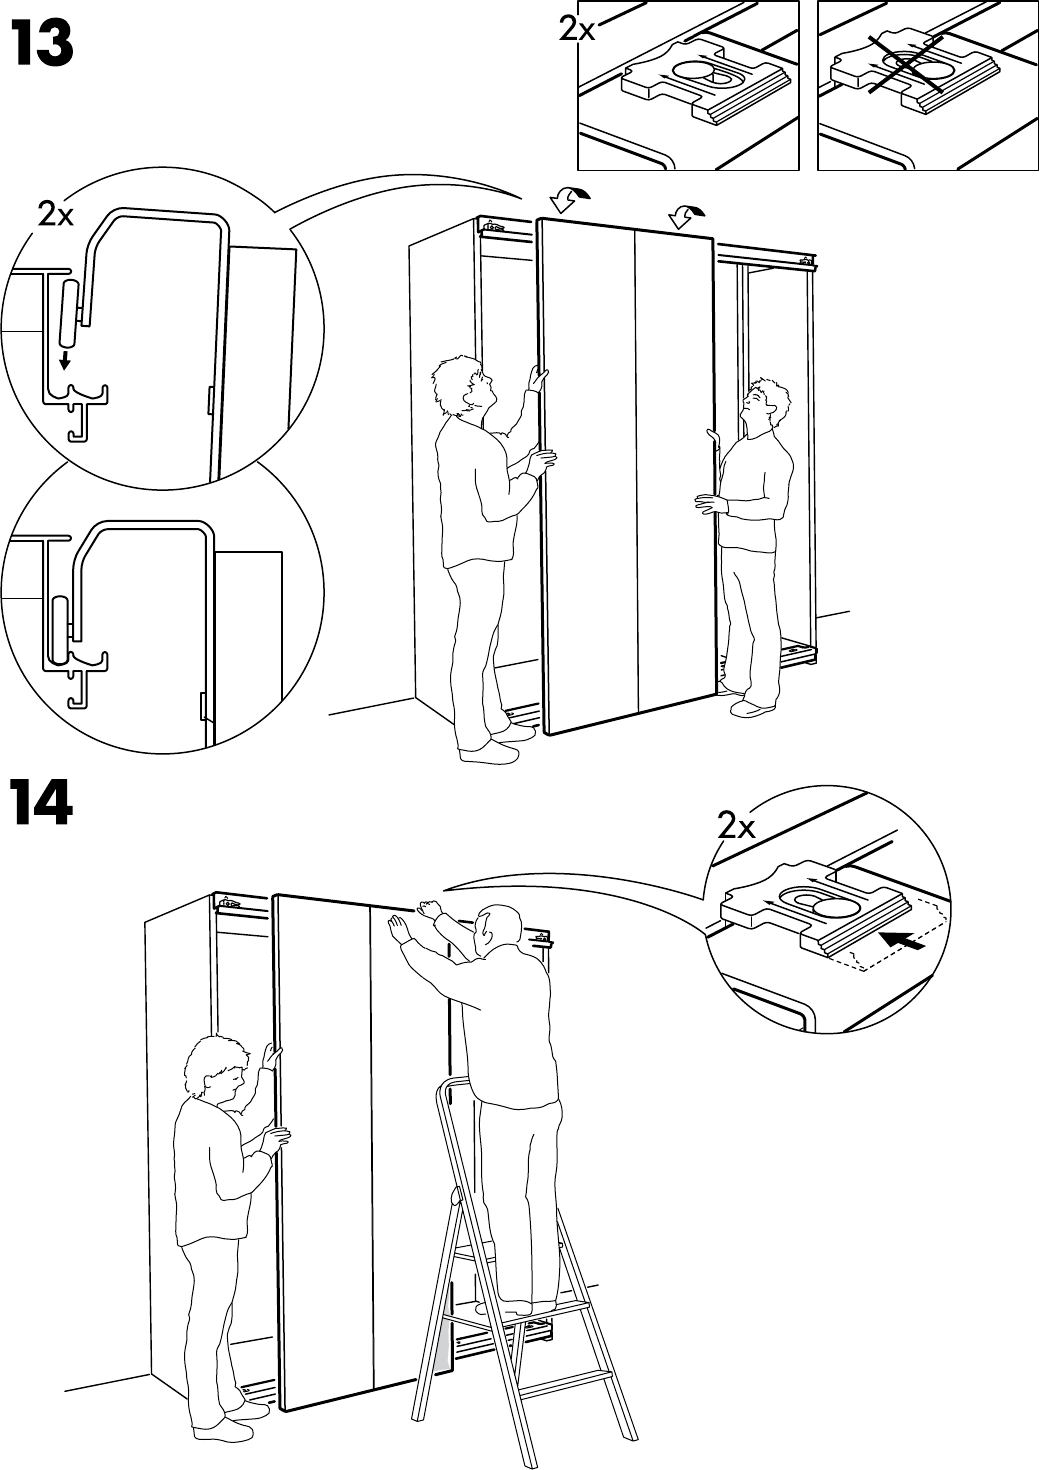 Handleiding Ikea Pax Hasvik 200 236 Pagina 15 Van 32